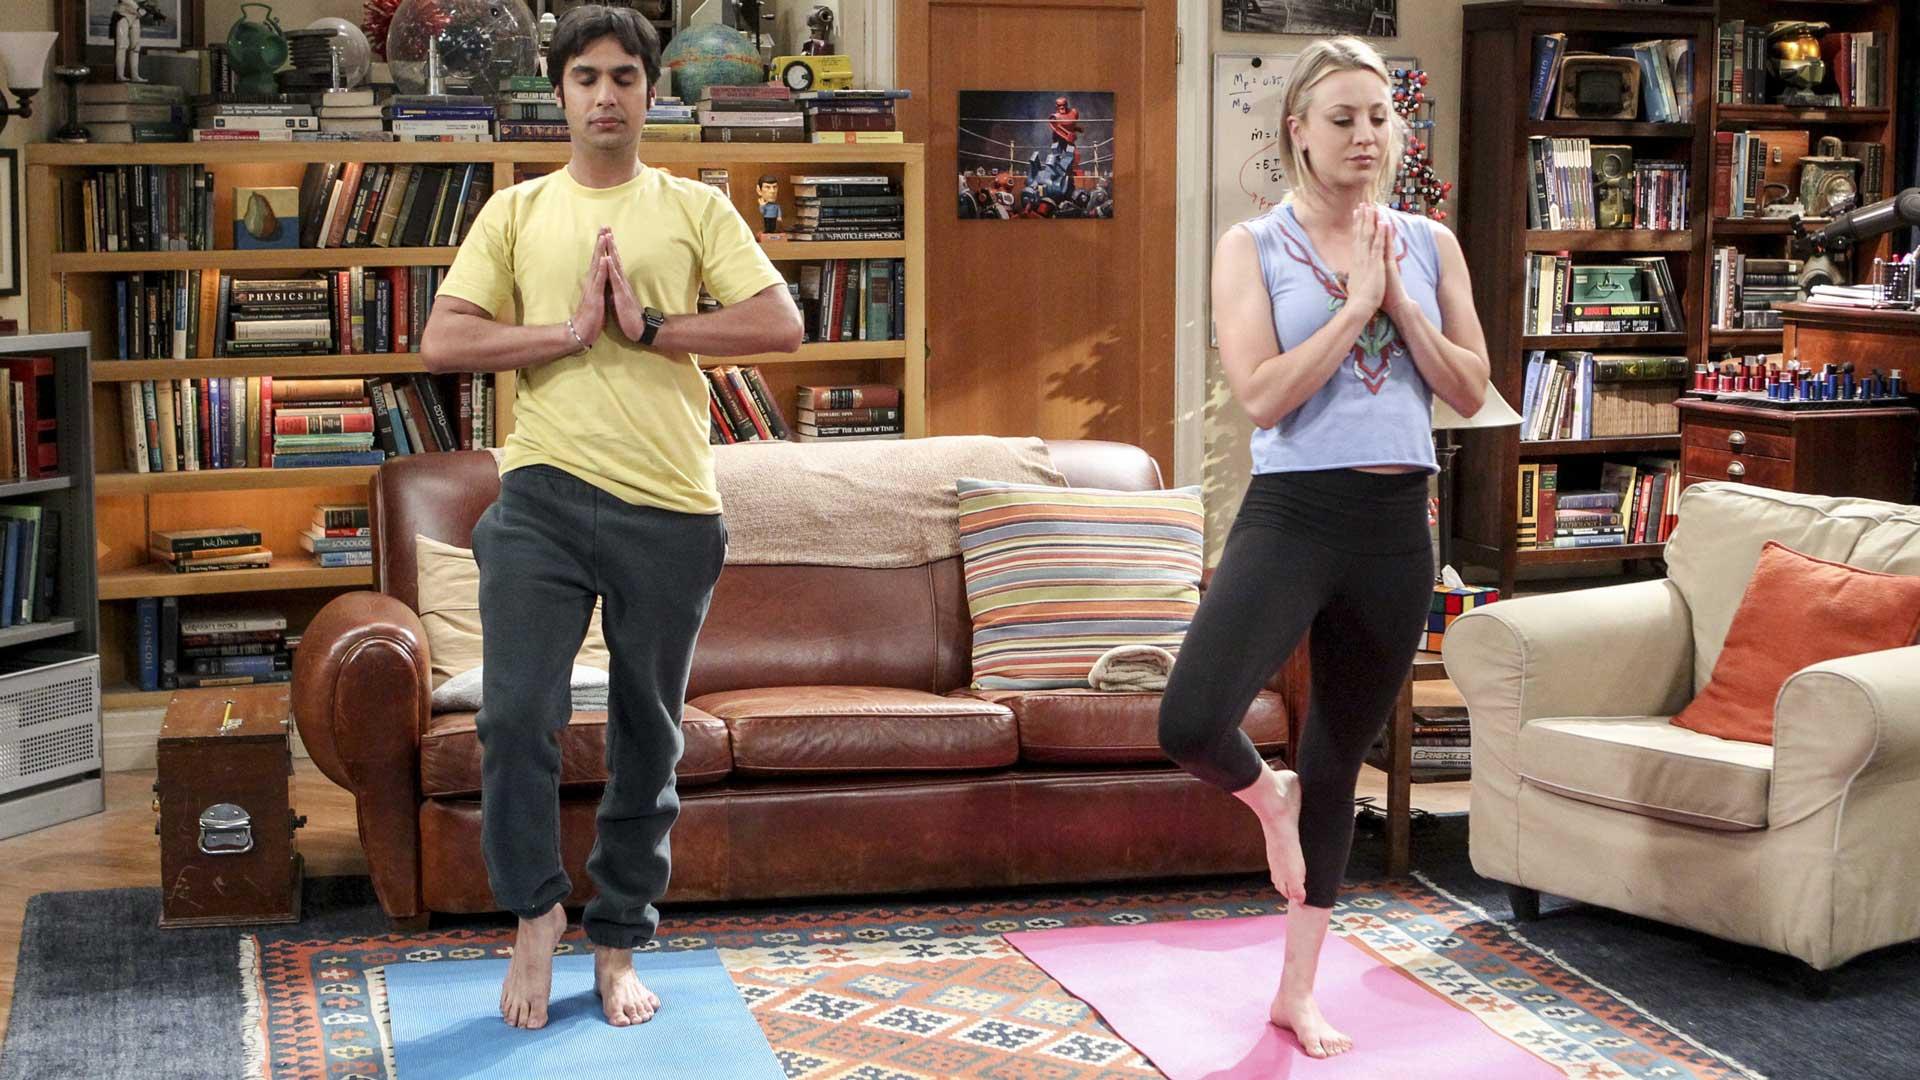 Namaste cool in Penny's Yoga gear.